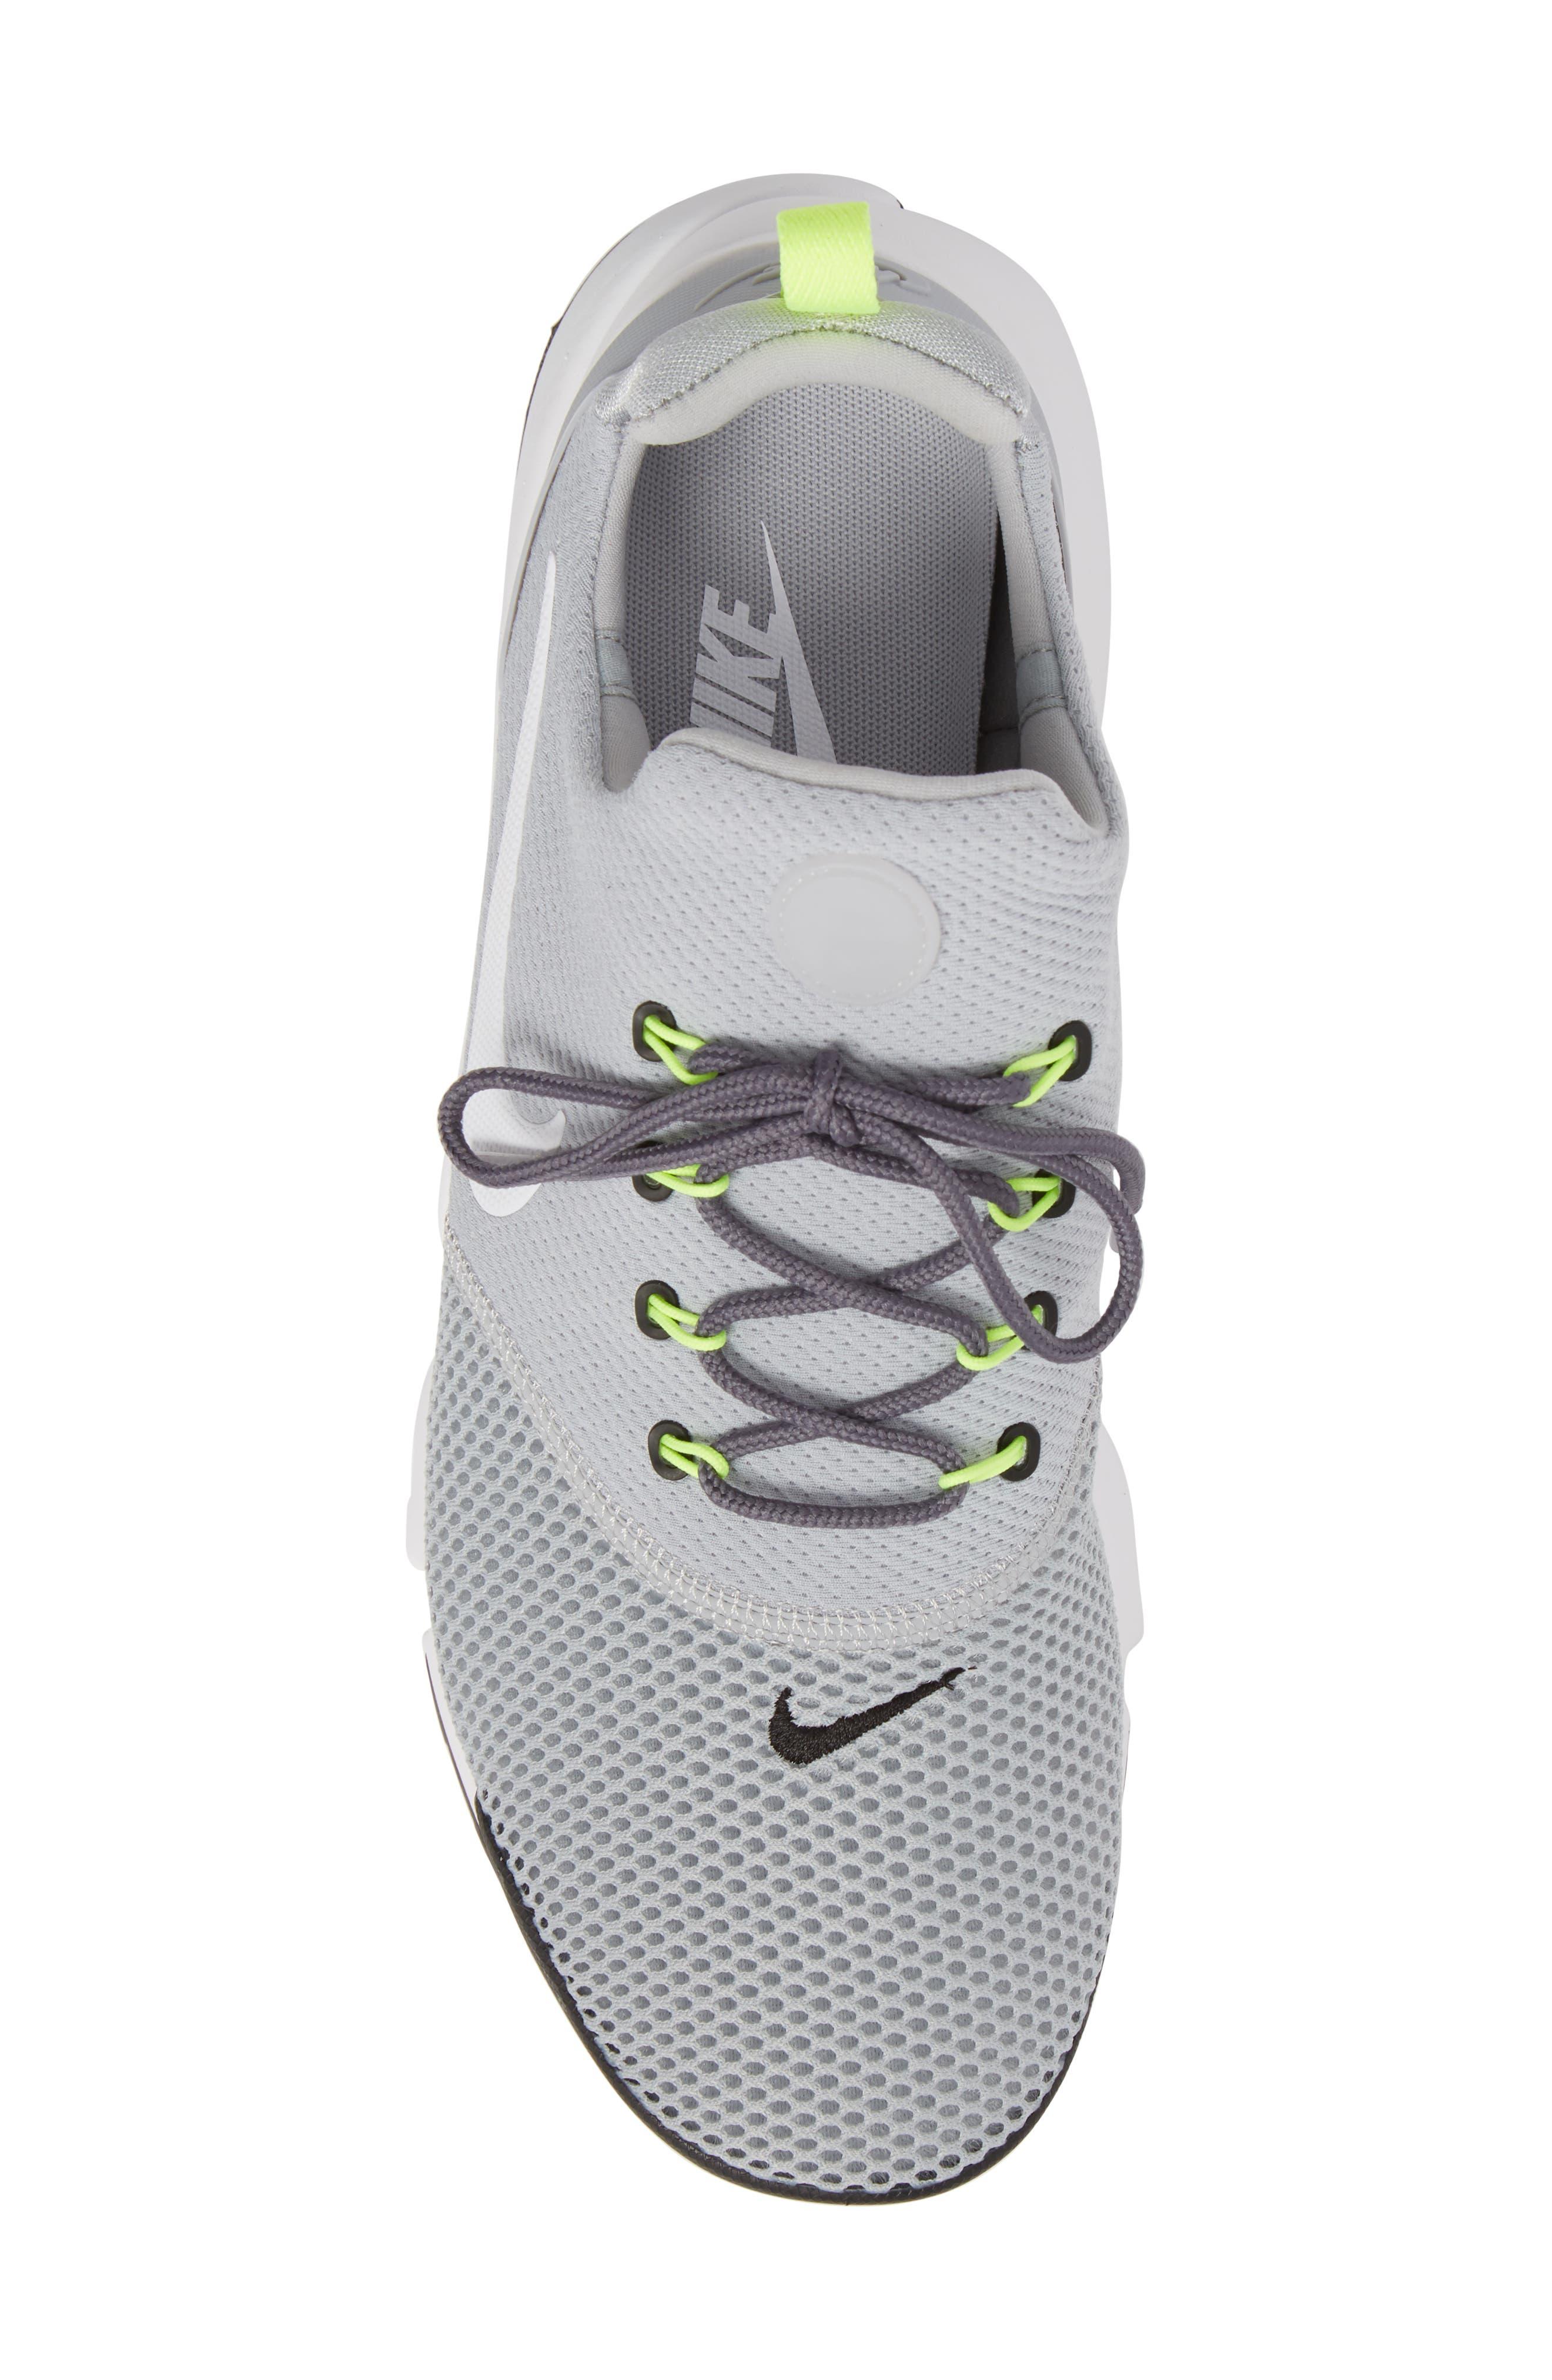 Presto Fly Sneaker,                             Alternate thumbnail 5, color,                             023